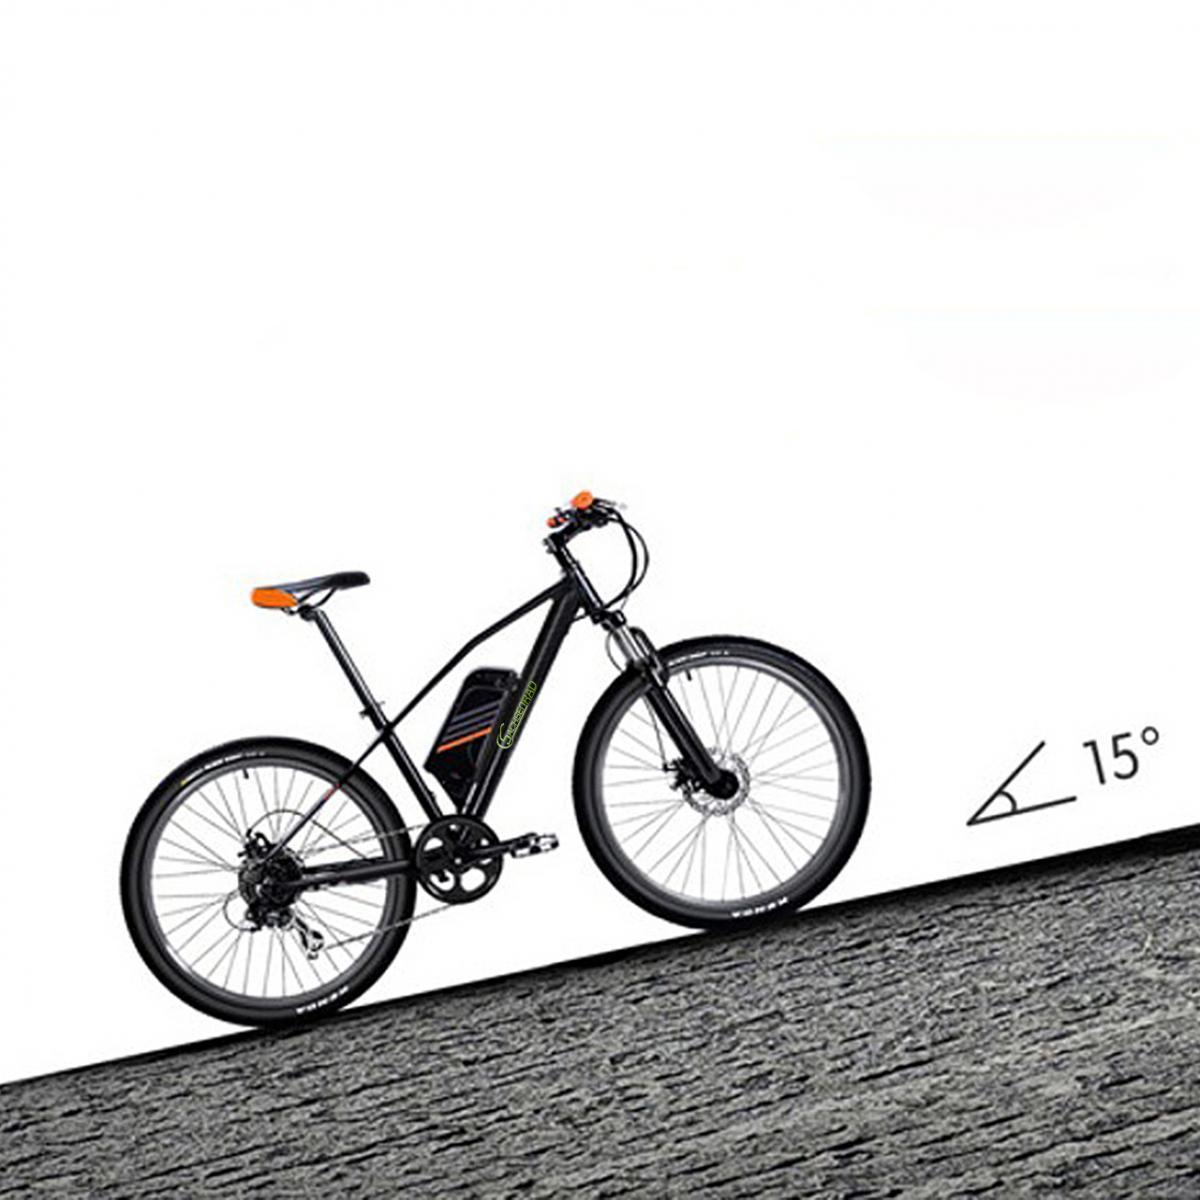 Bild 2 von SachsenRad E-Racing Bike R6